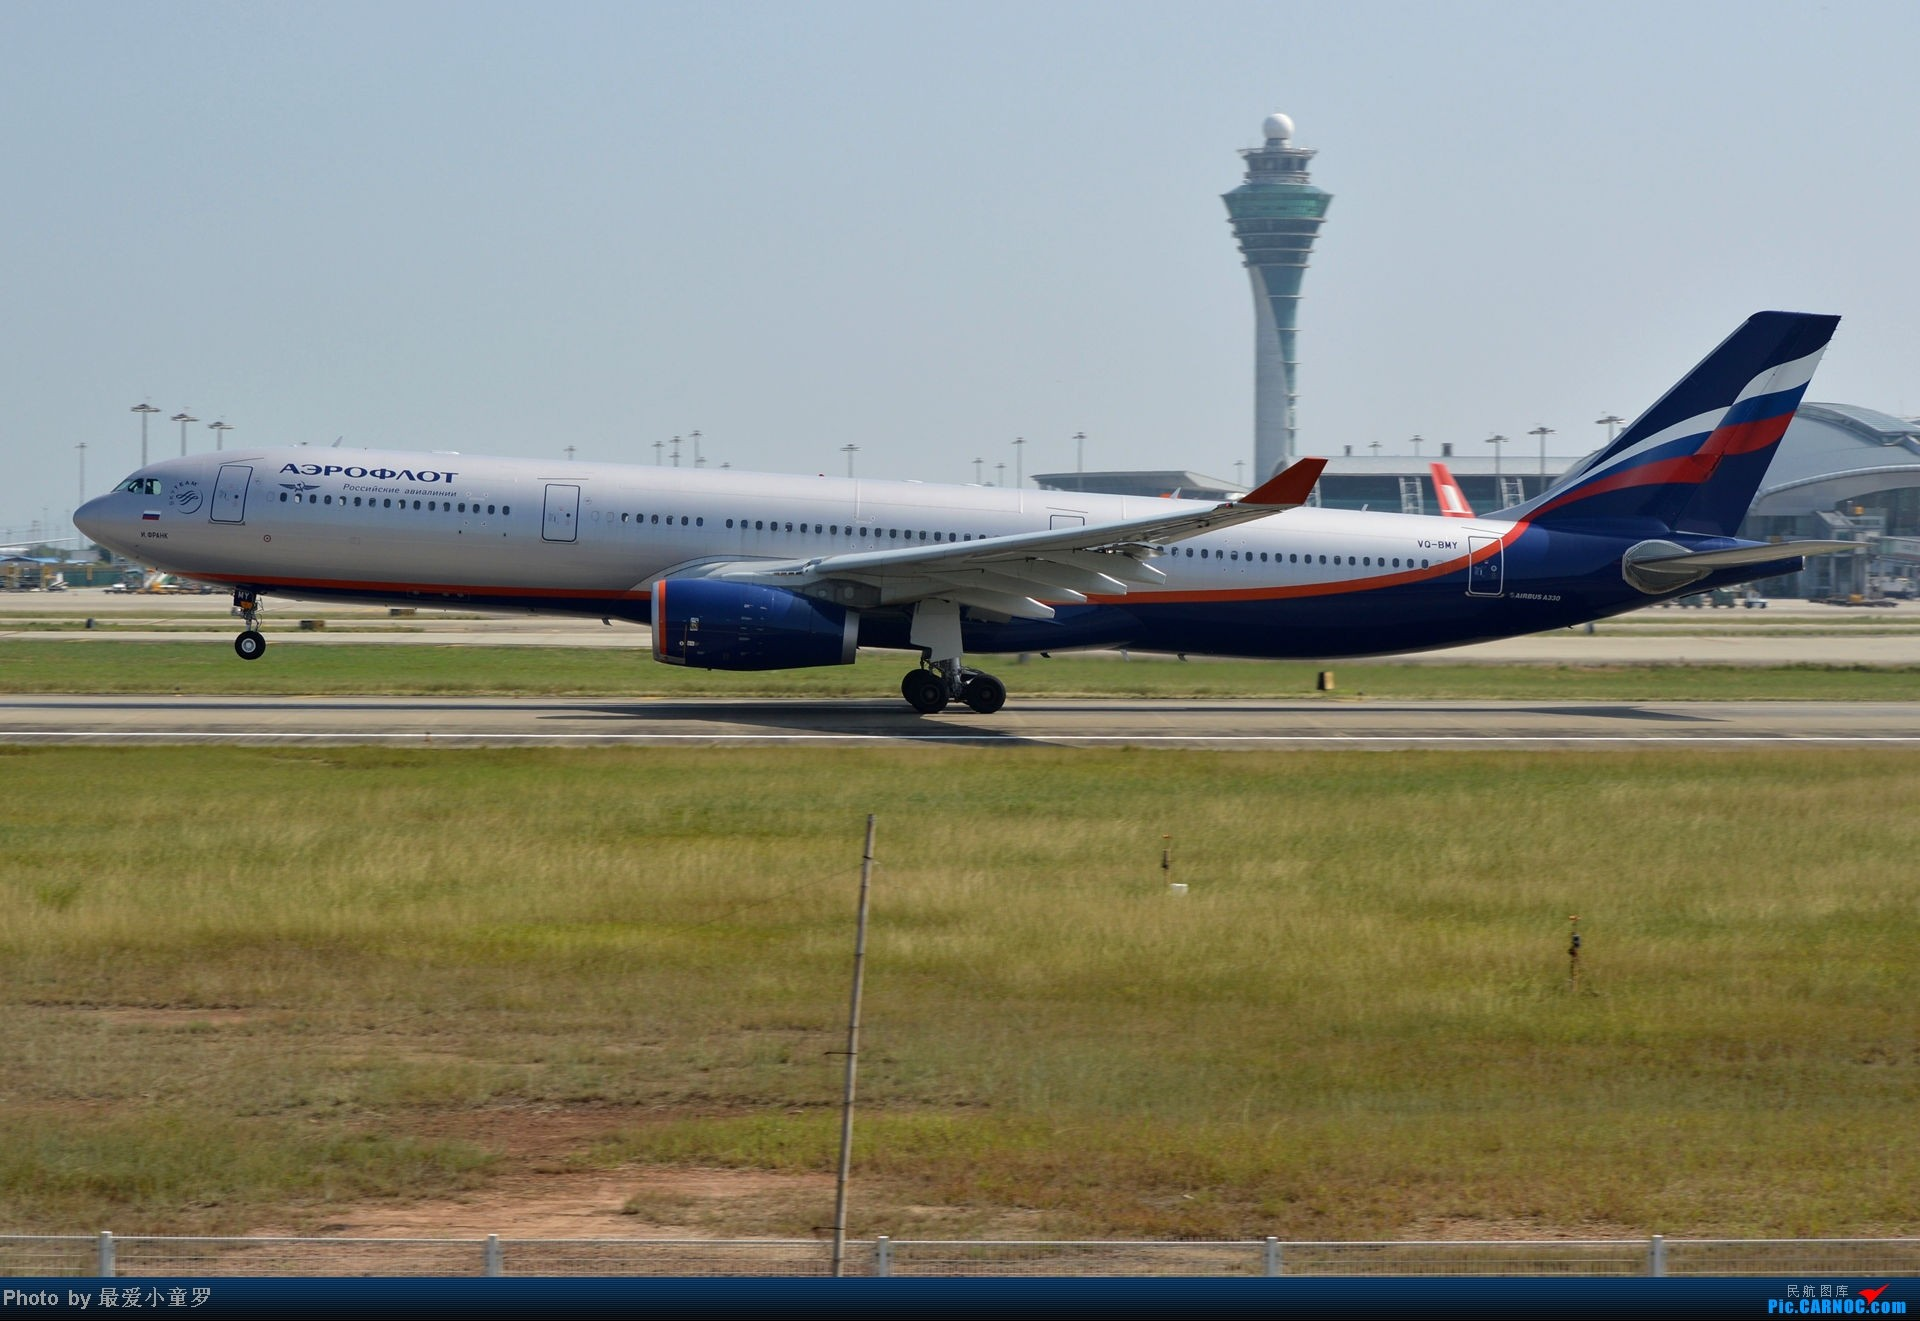 Re:[原创]老图系列,13年11月15日广州白云机场西跑拍机 AIRBUS A330-300 VQ-BMY 中国广州白云机场